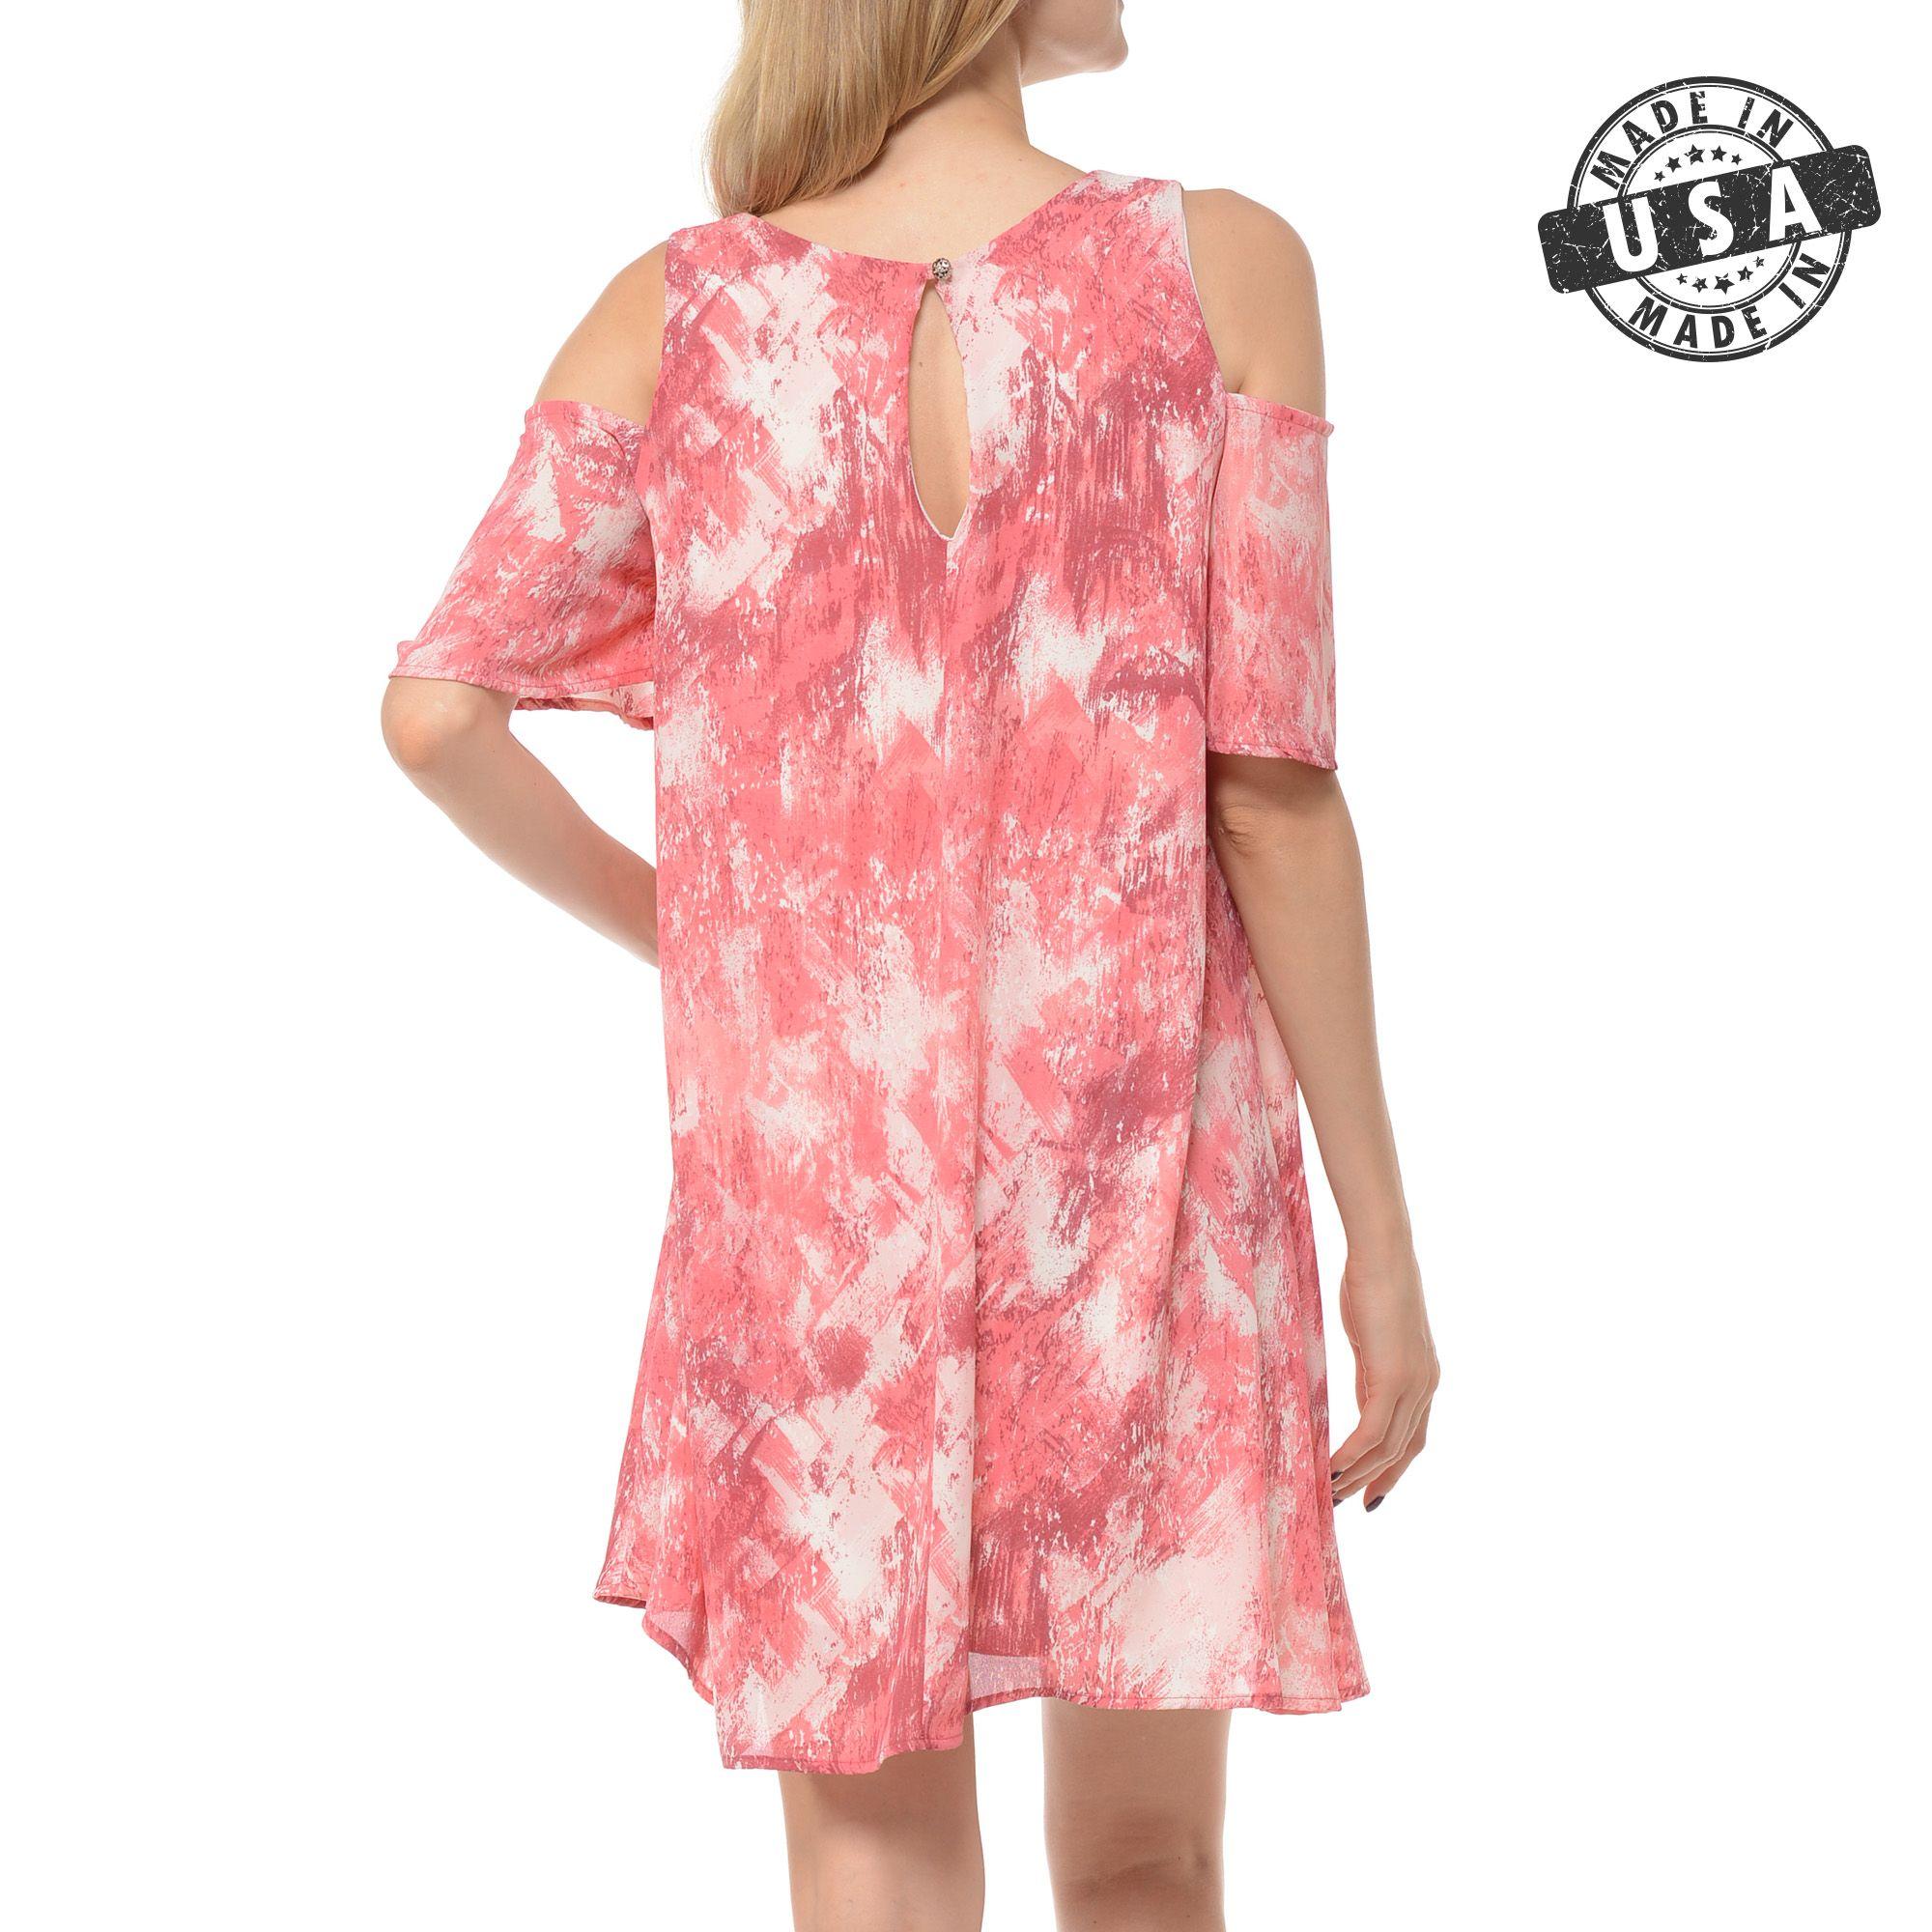 Basico Women S Open Cold Shoulder Semi Casual Flowy Mini Dress Made In Usa Walmart Com Flowy Mini Dress Short Sleeve Mini Dress Flowy Dress Short [ 2000 x 2000 Pixel ]